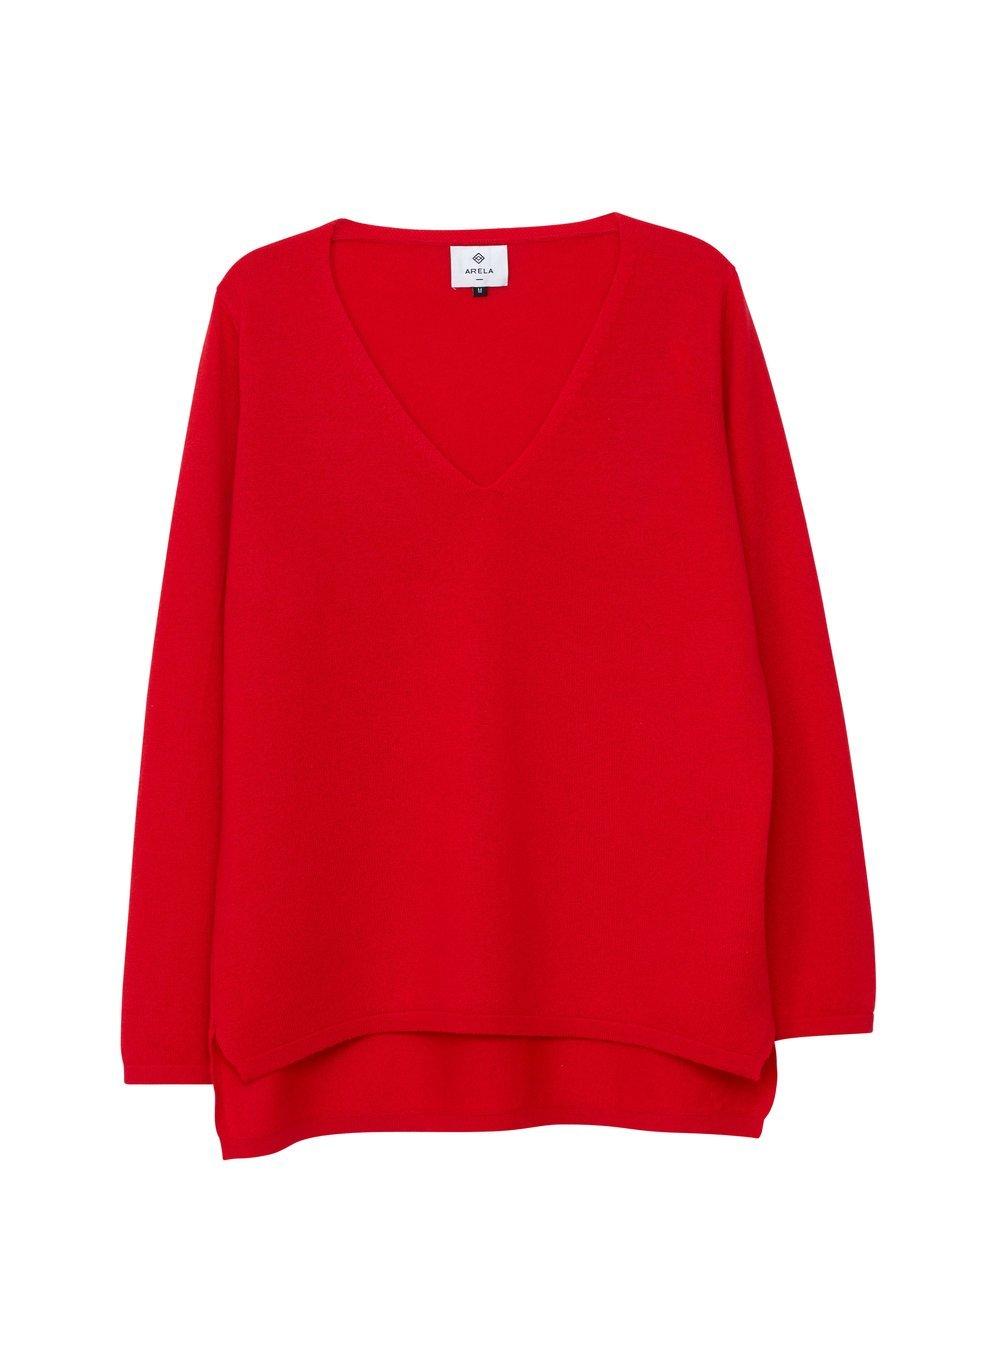 ARELA Vija Cashmere Sweater In Red